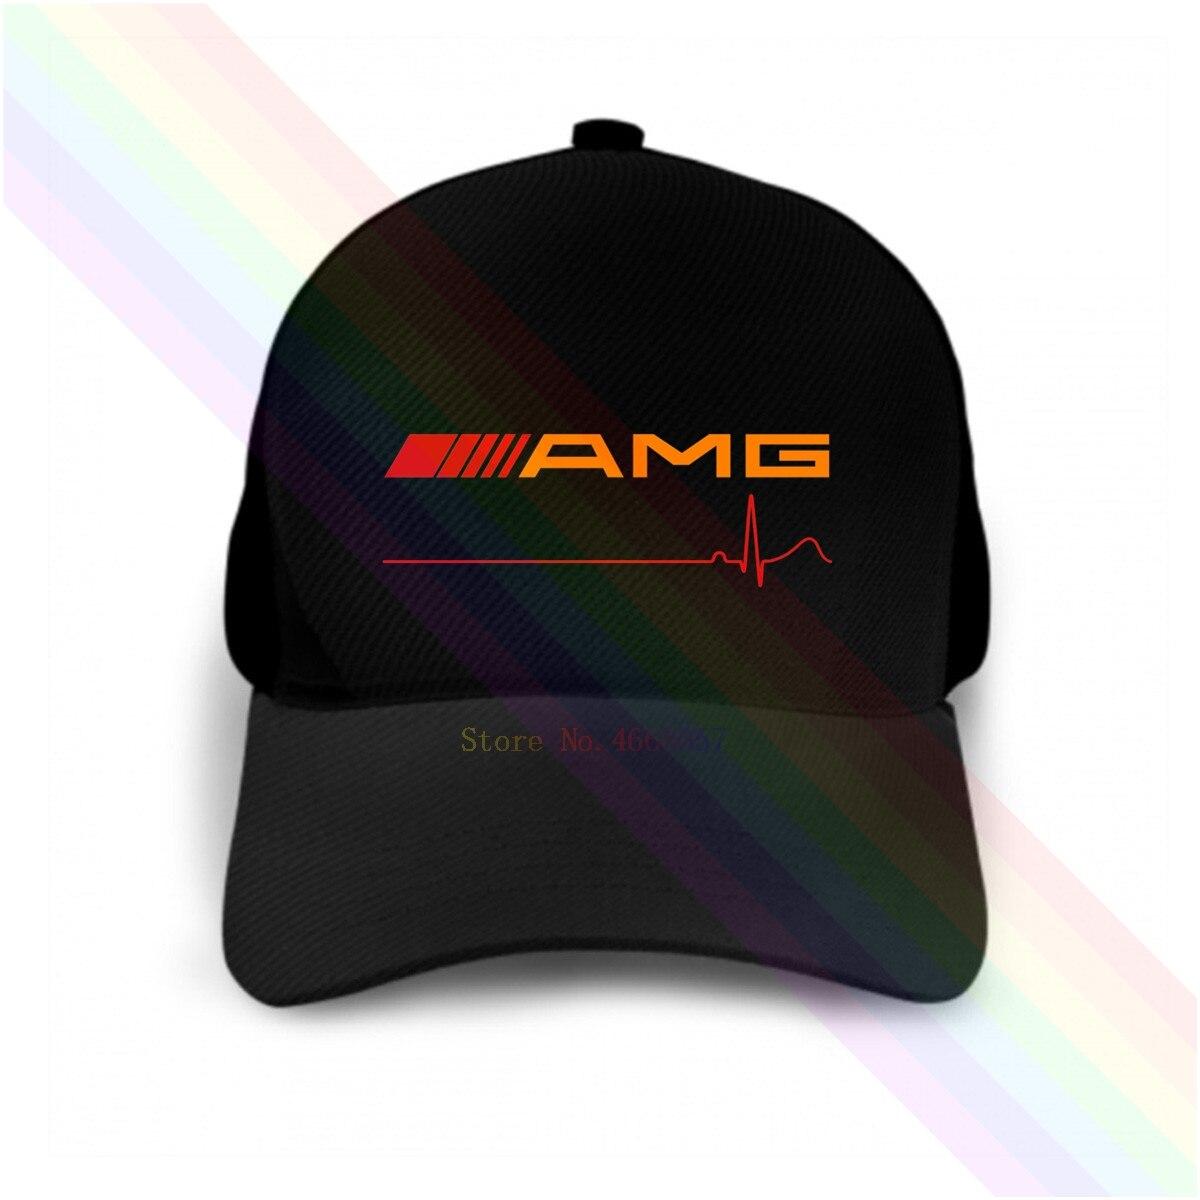 Driving Performance Amg Black 2020 Newest Black Popular Baseball Cap Hats Unisex